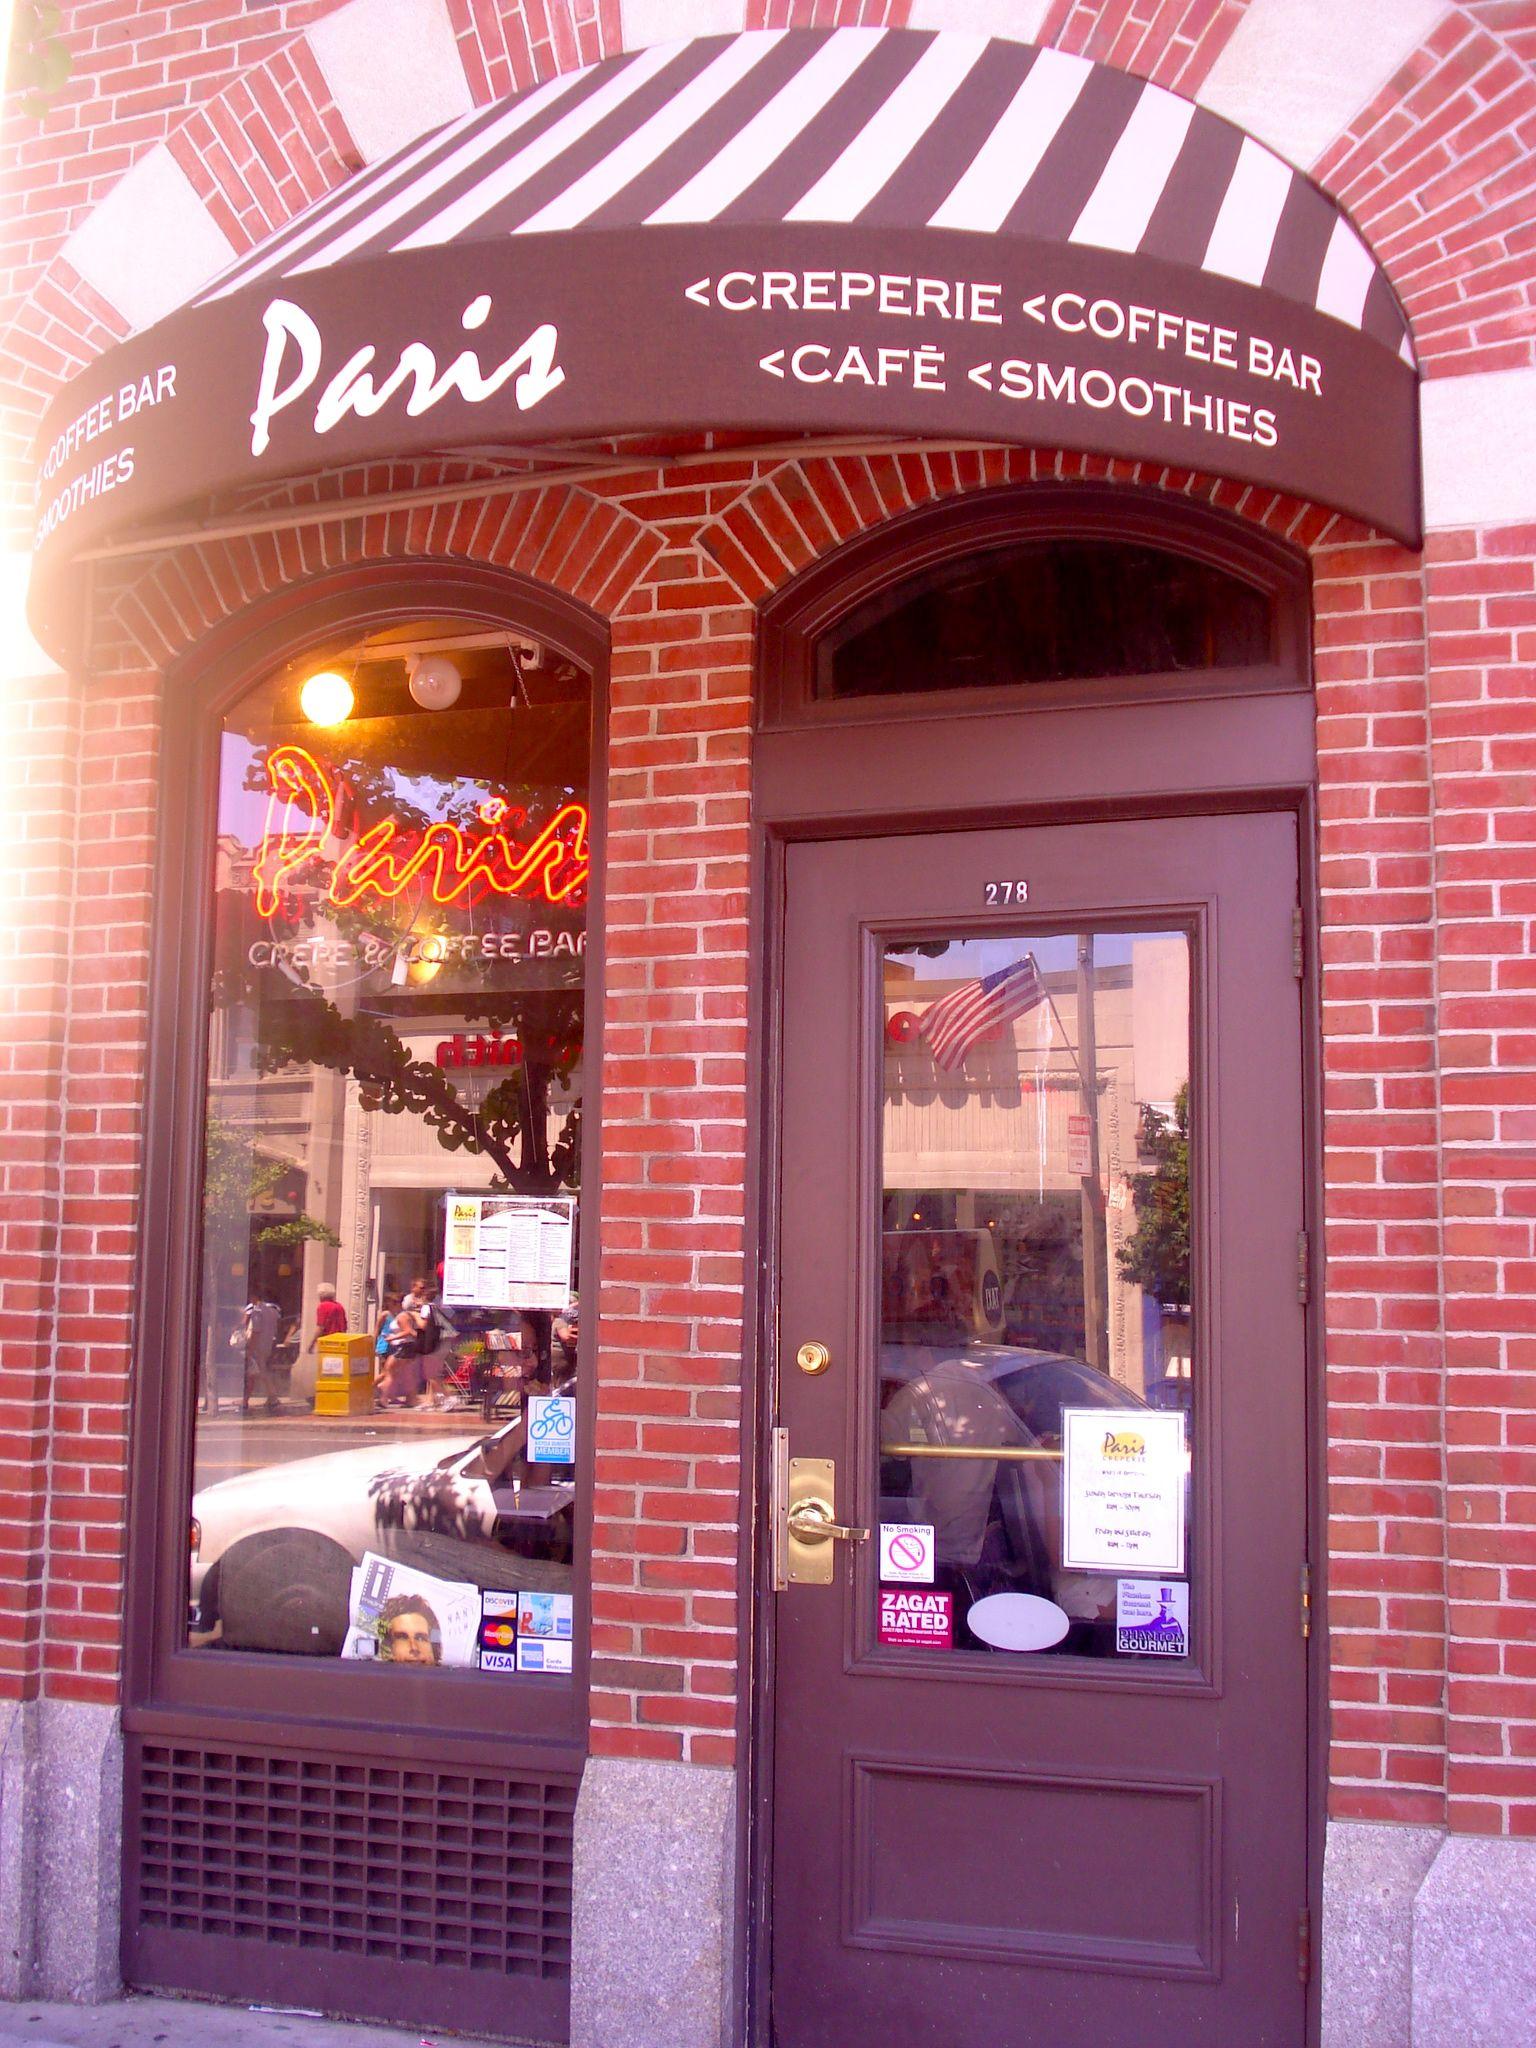 Crepe Shop in Boston